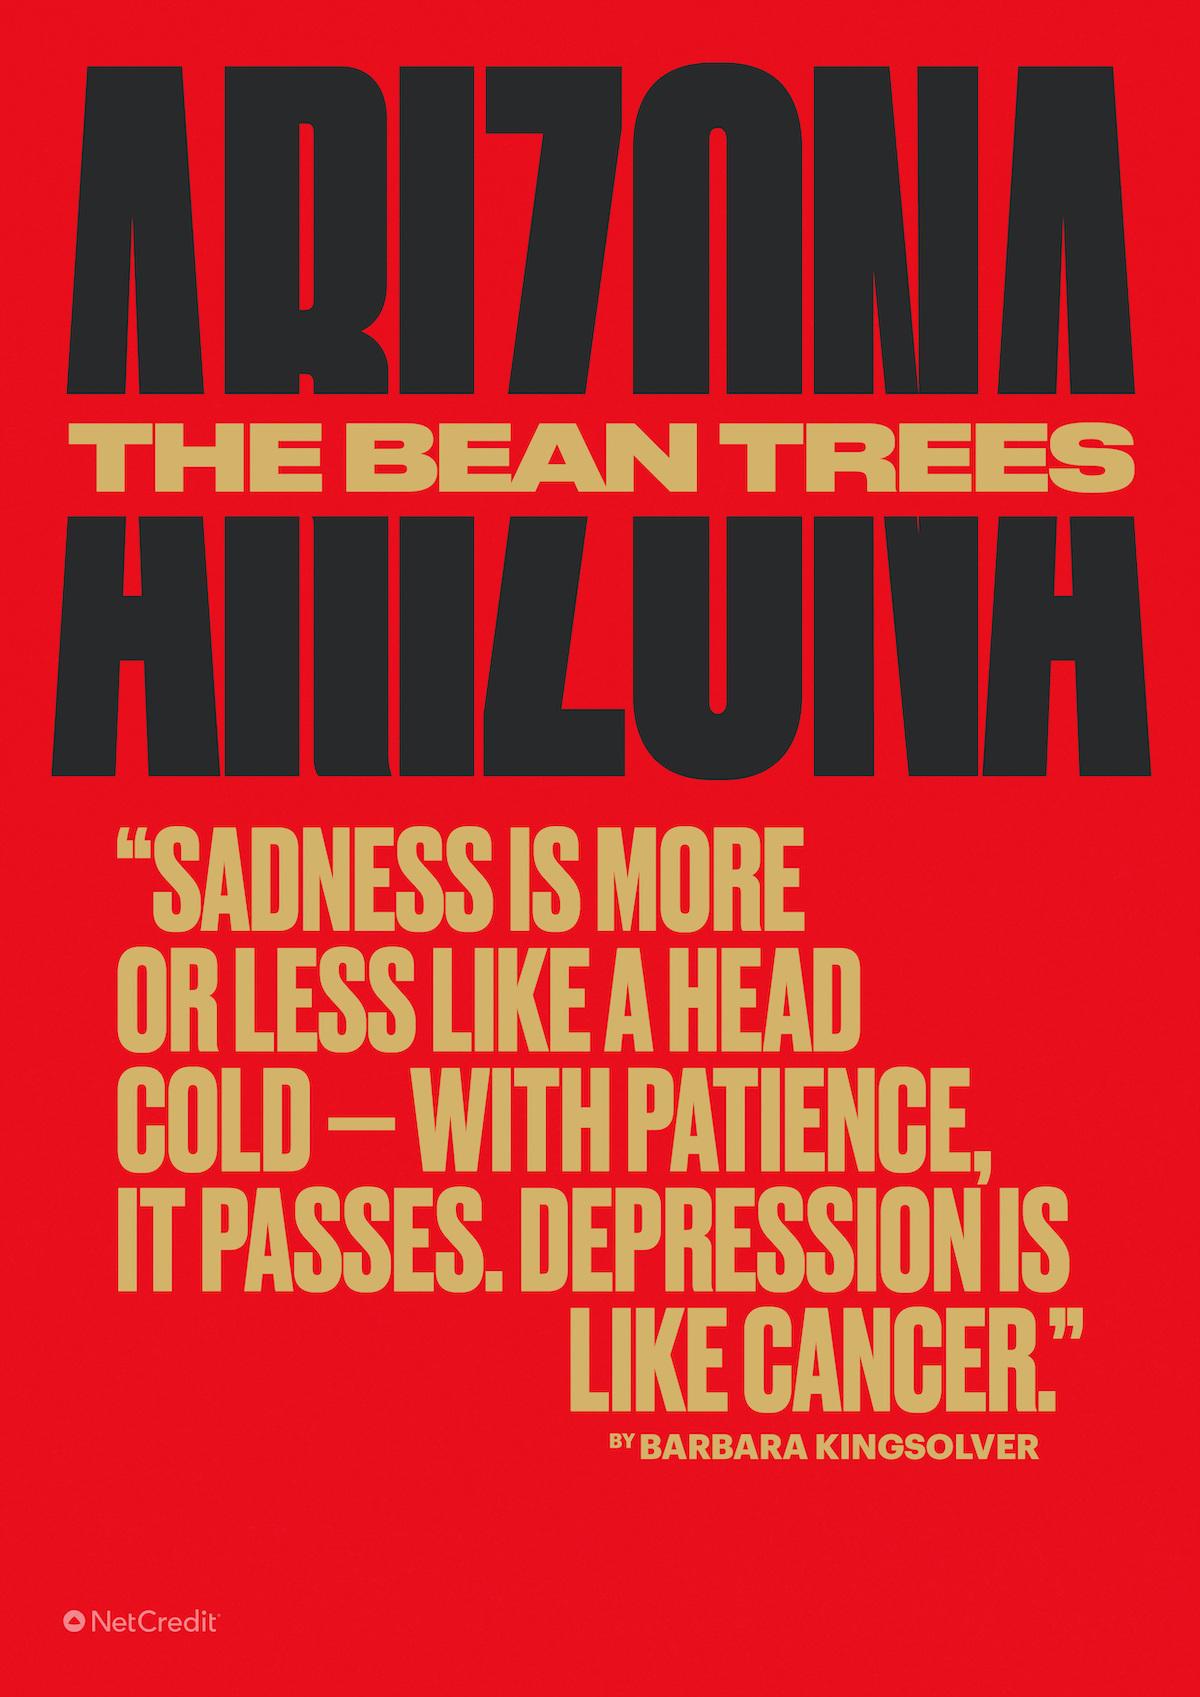 Arizona Bean Trees